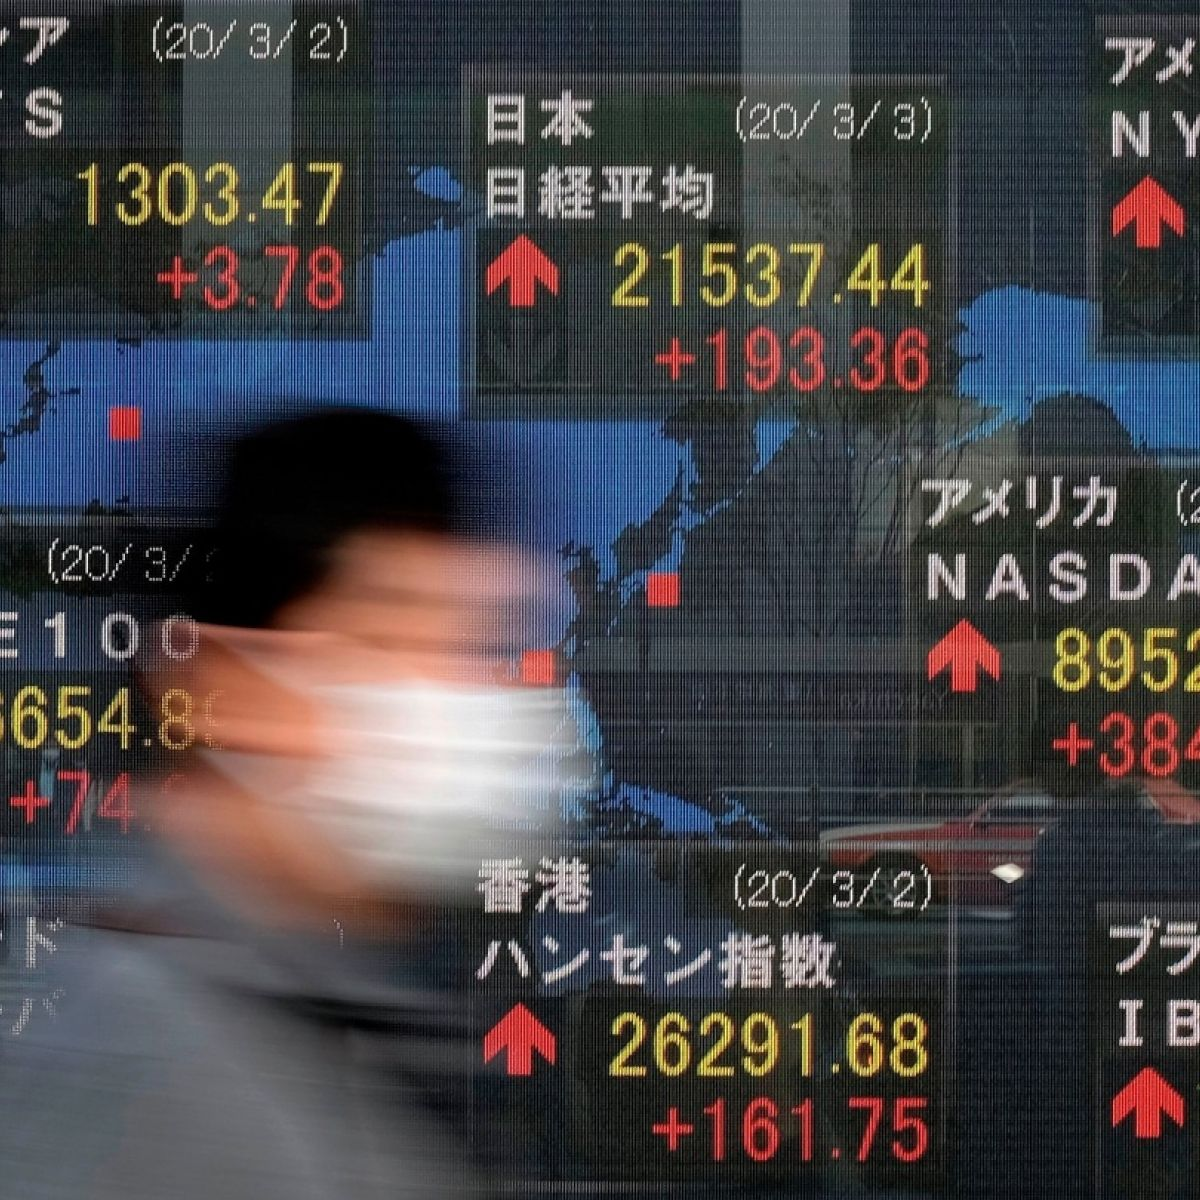 Cryptocurrencies amongst asset class hardest hit on Black Monday